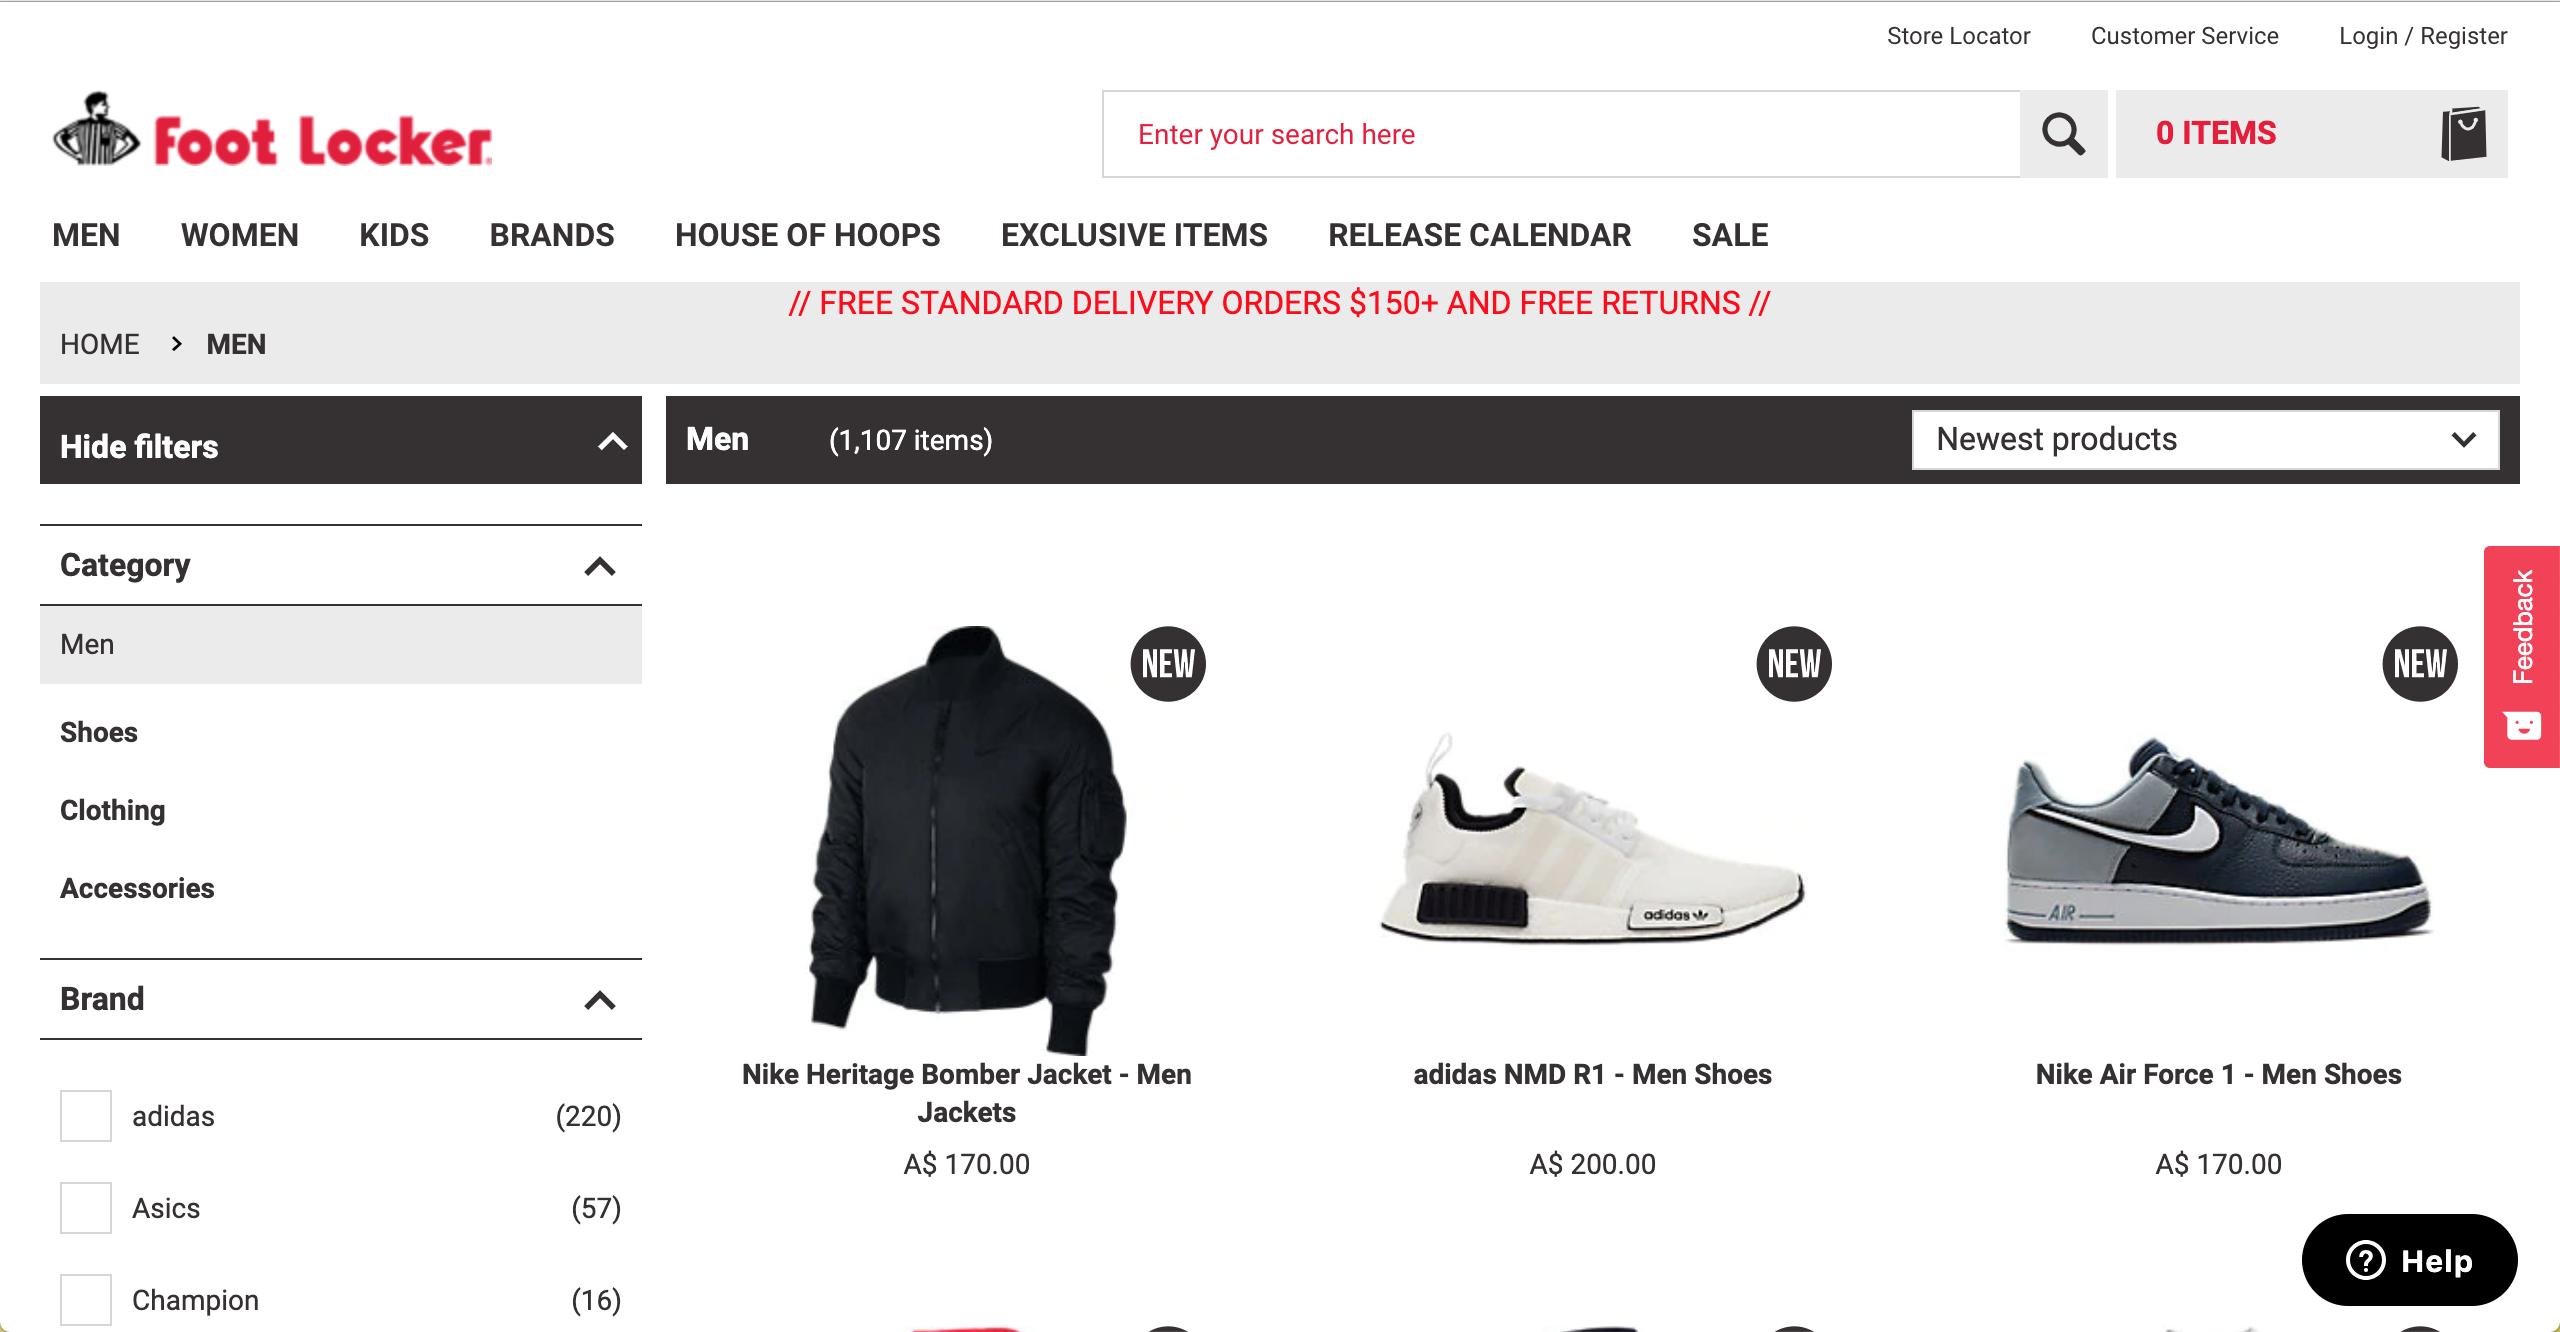 Foot Locker Men s product page